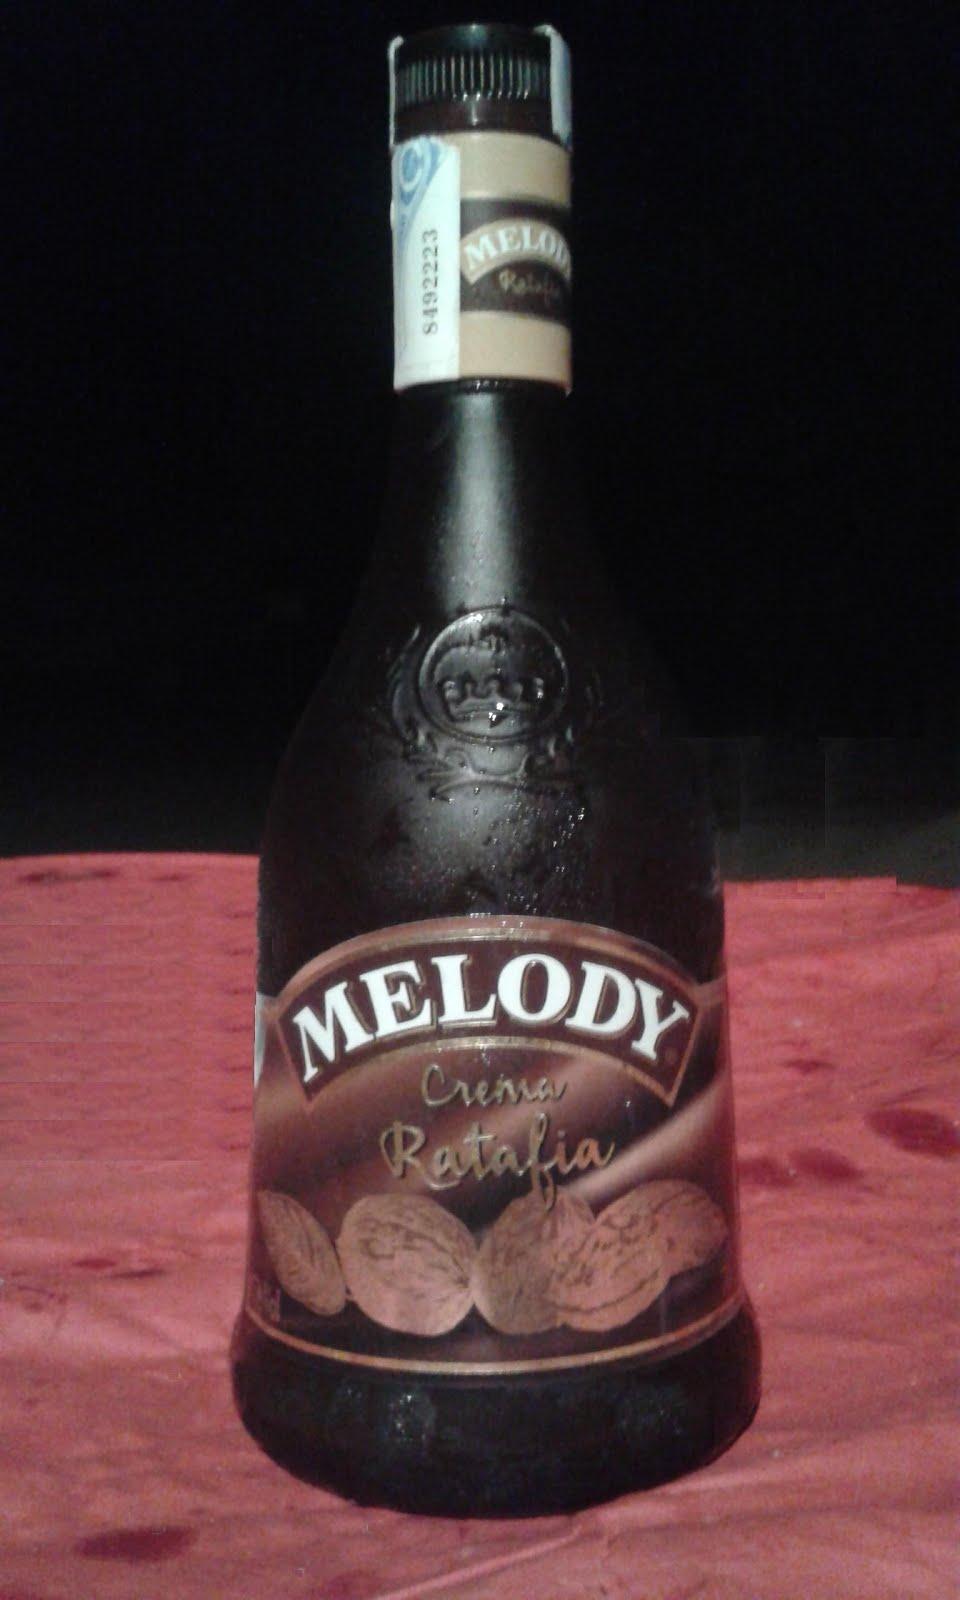 crema de ratafia Meldoy (el masnou)